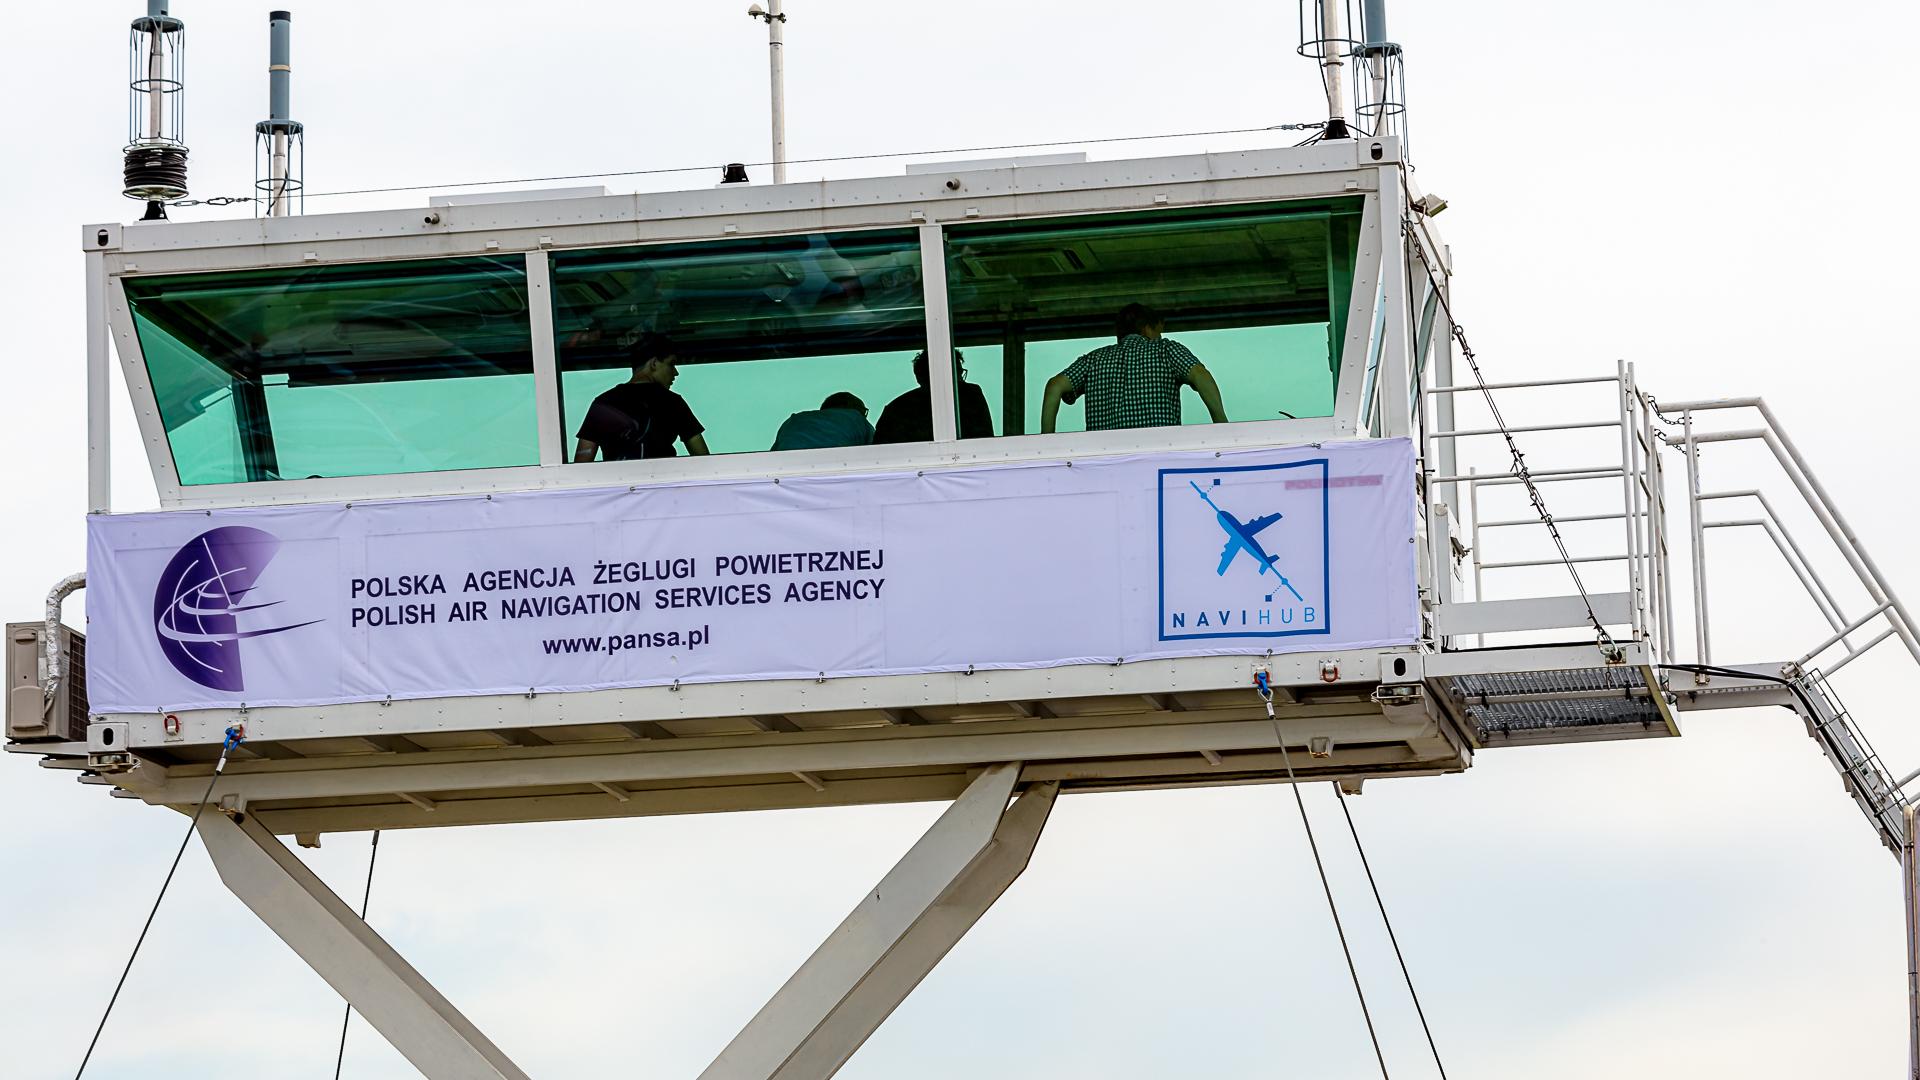 Projekt NAVIHUB, czyli fundament pod cyfrowe lotnisko